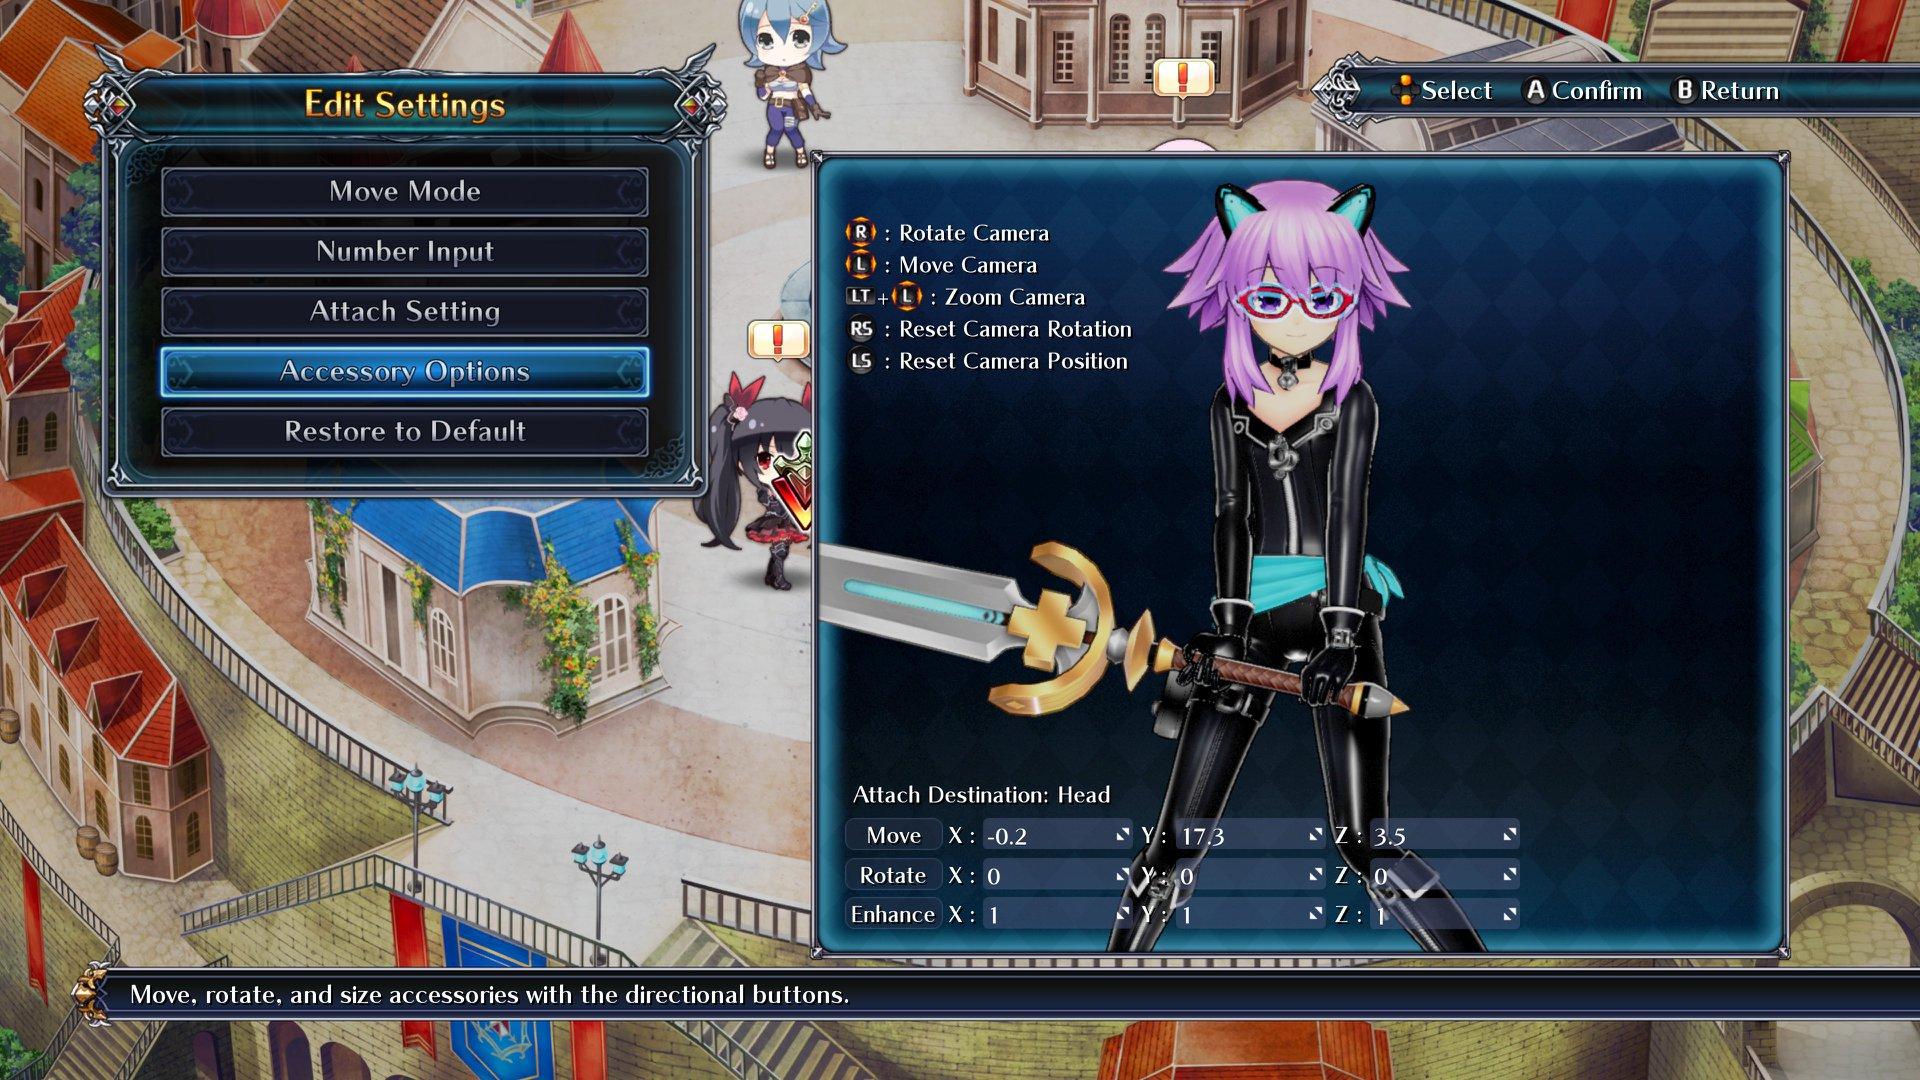 RE-REVIEW: Cyberdimension Neptunia 4 Goddesses Online - oprainfall